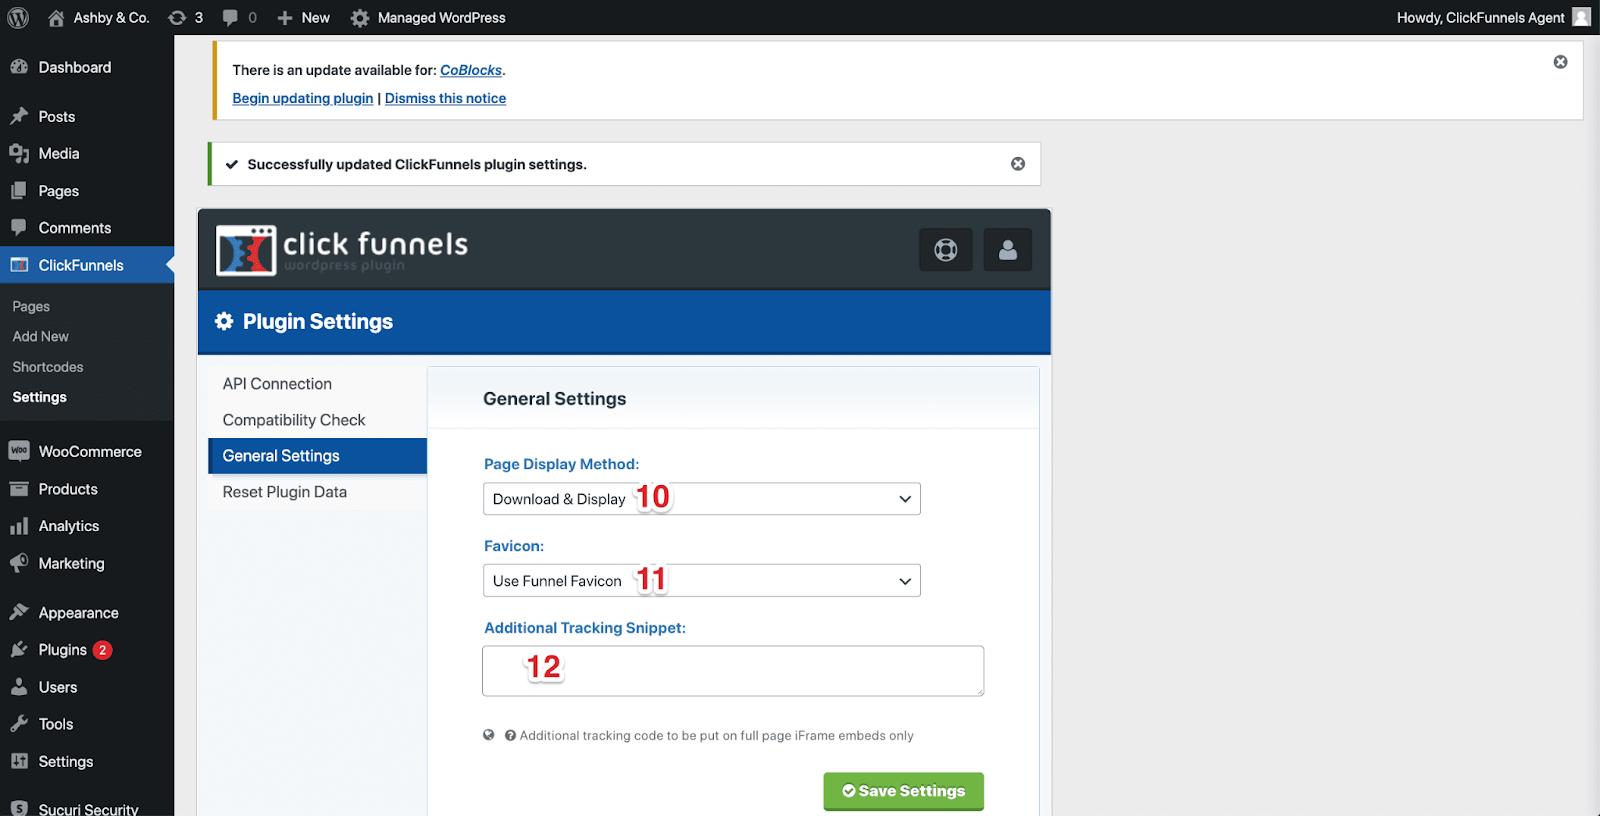 The ClickFunnels WordPress dashboard